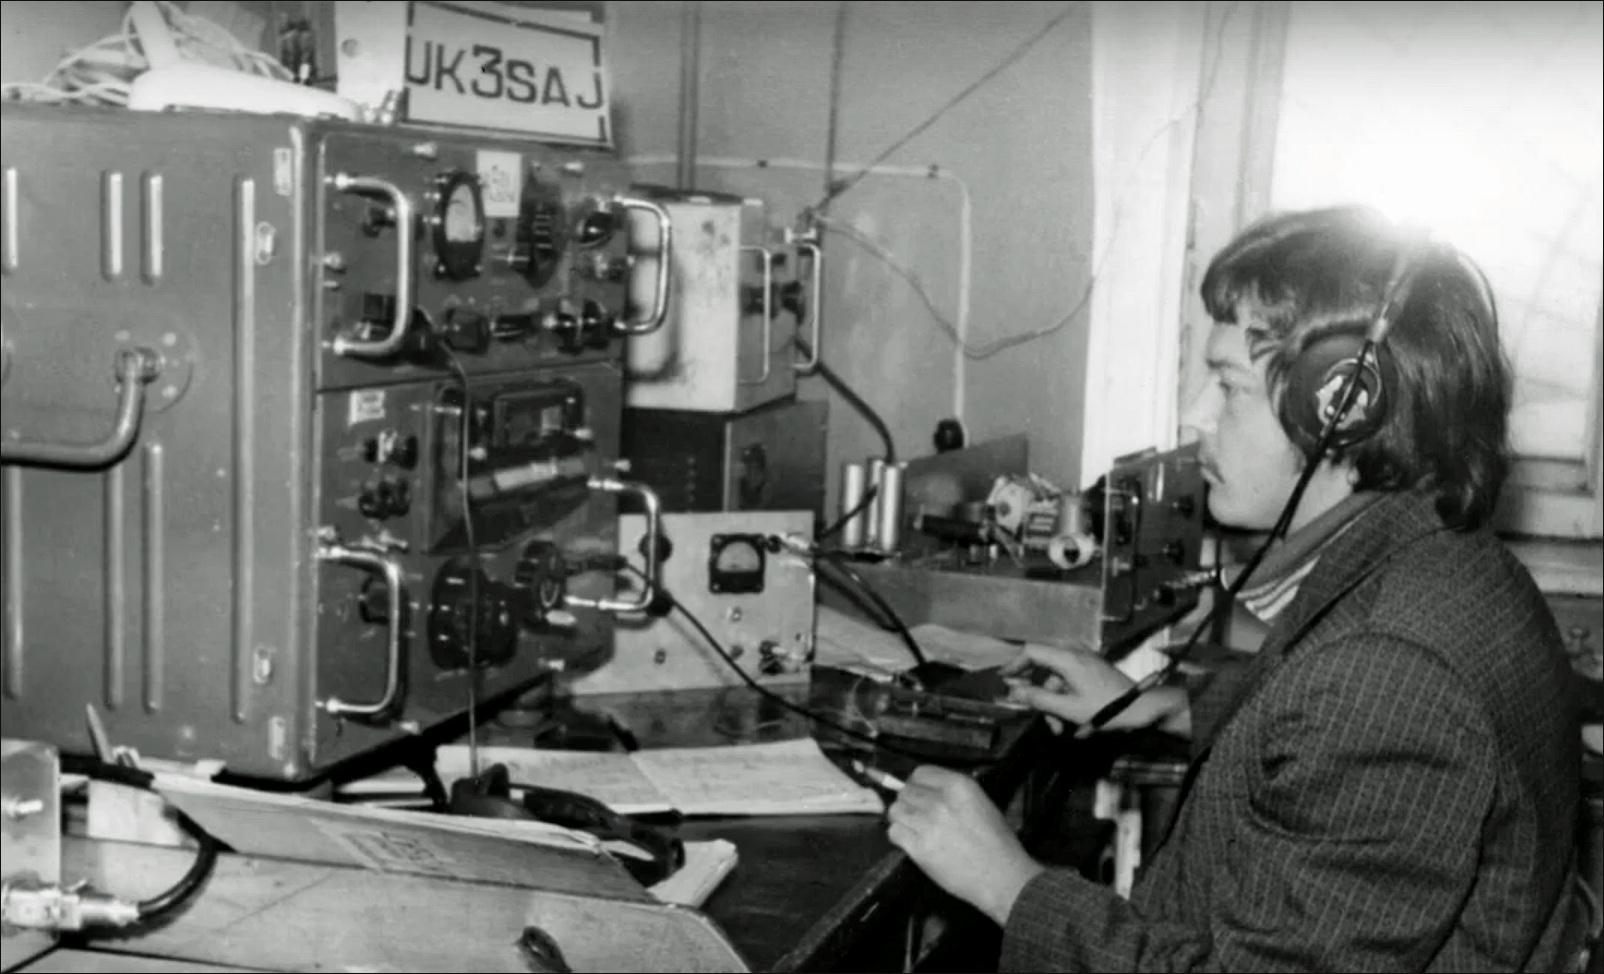 uk3saj-ra3ss-1976.jpg